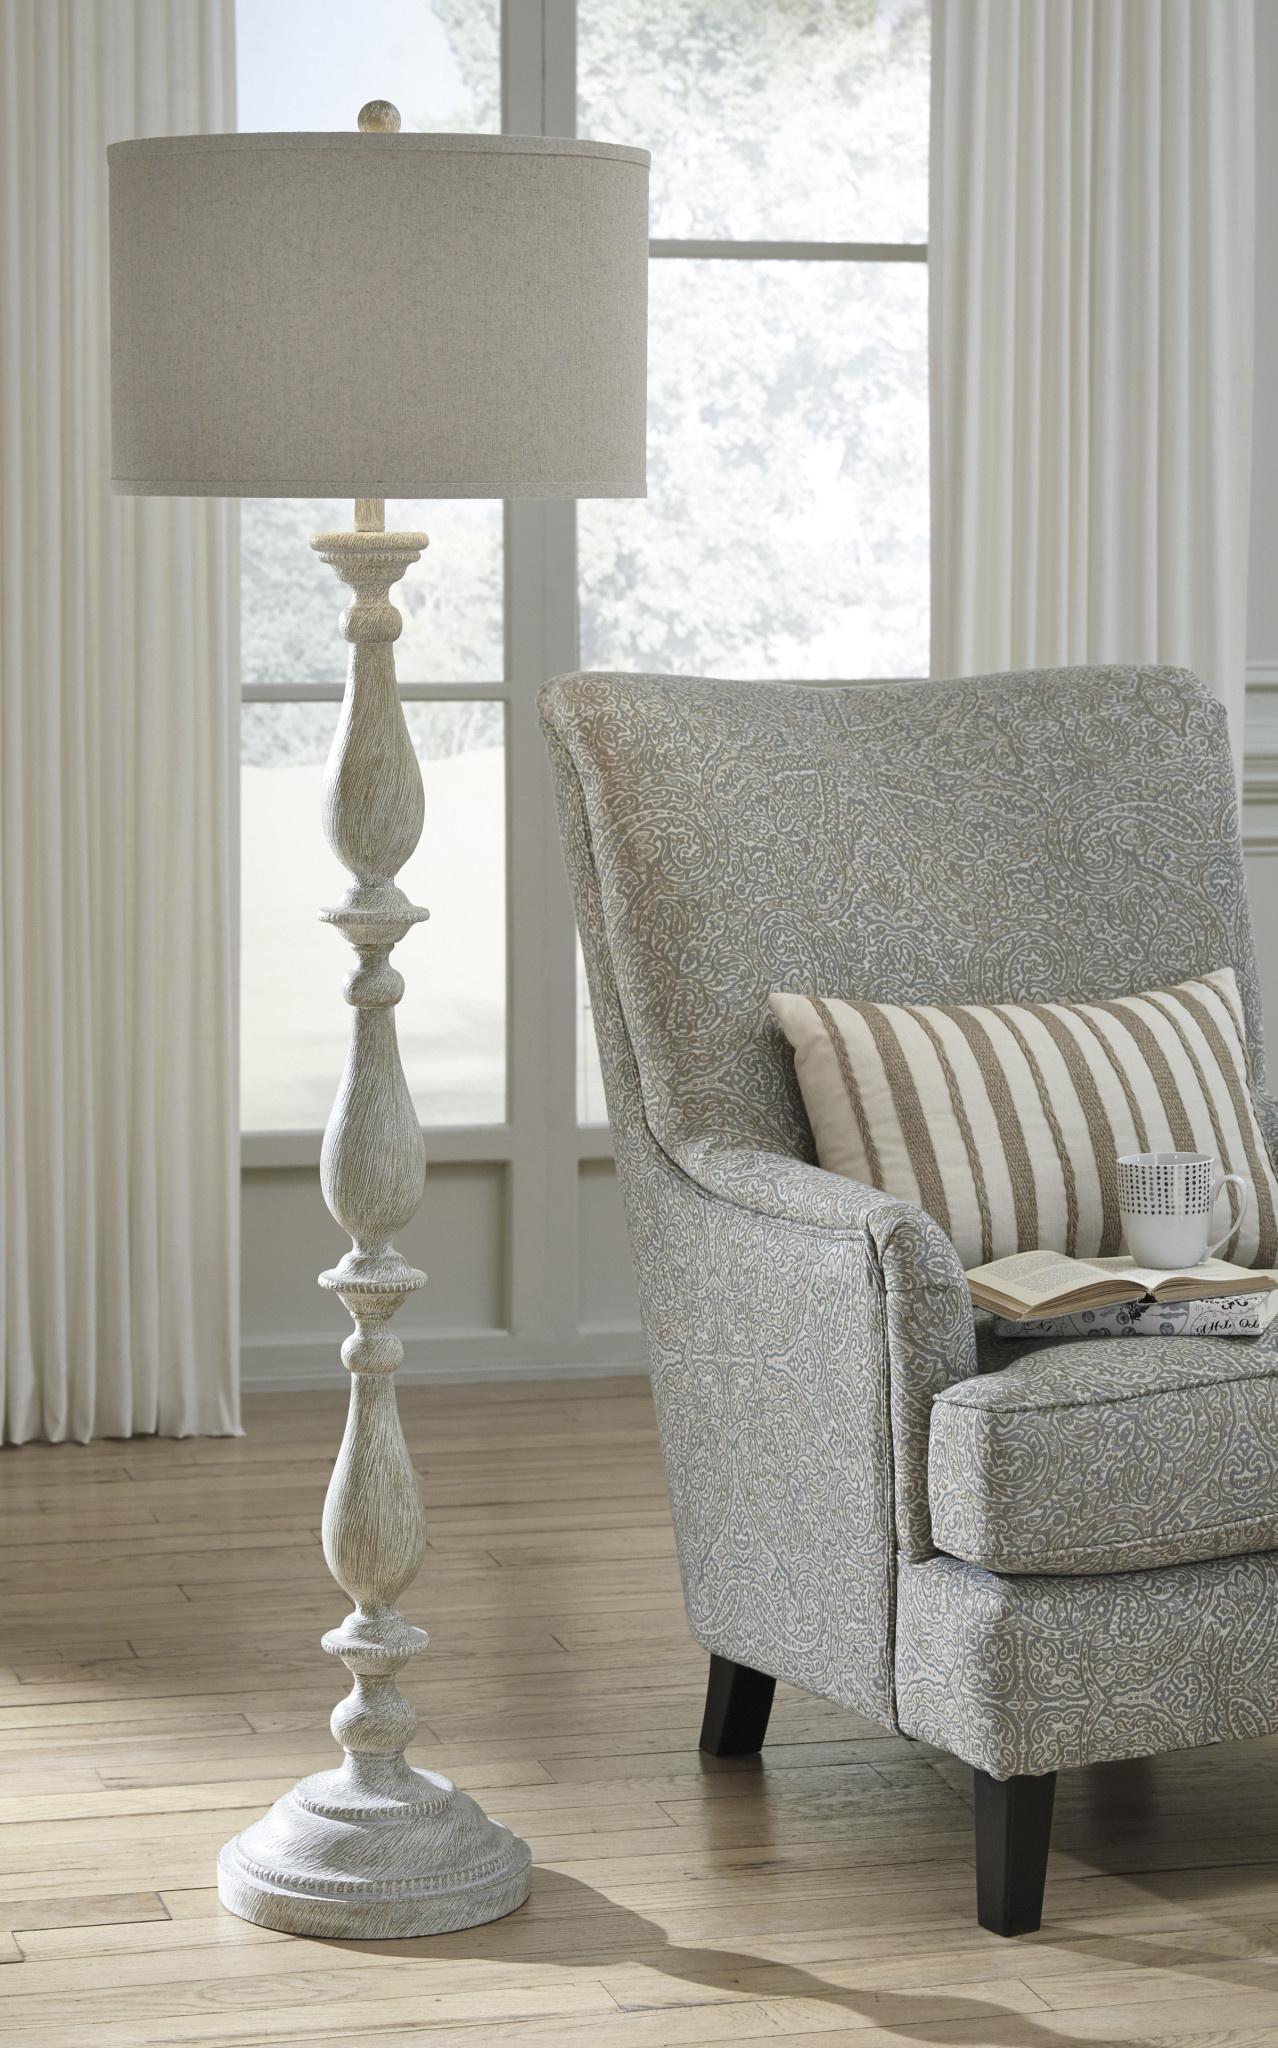 Bernadate- Whitewash Floor Lamp- L235341